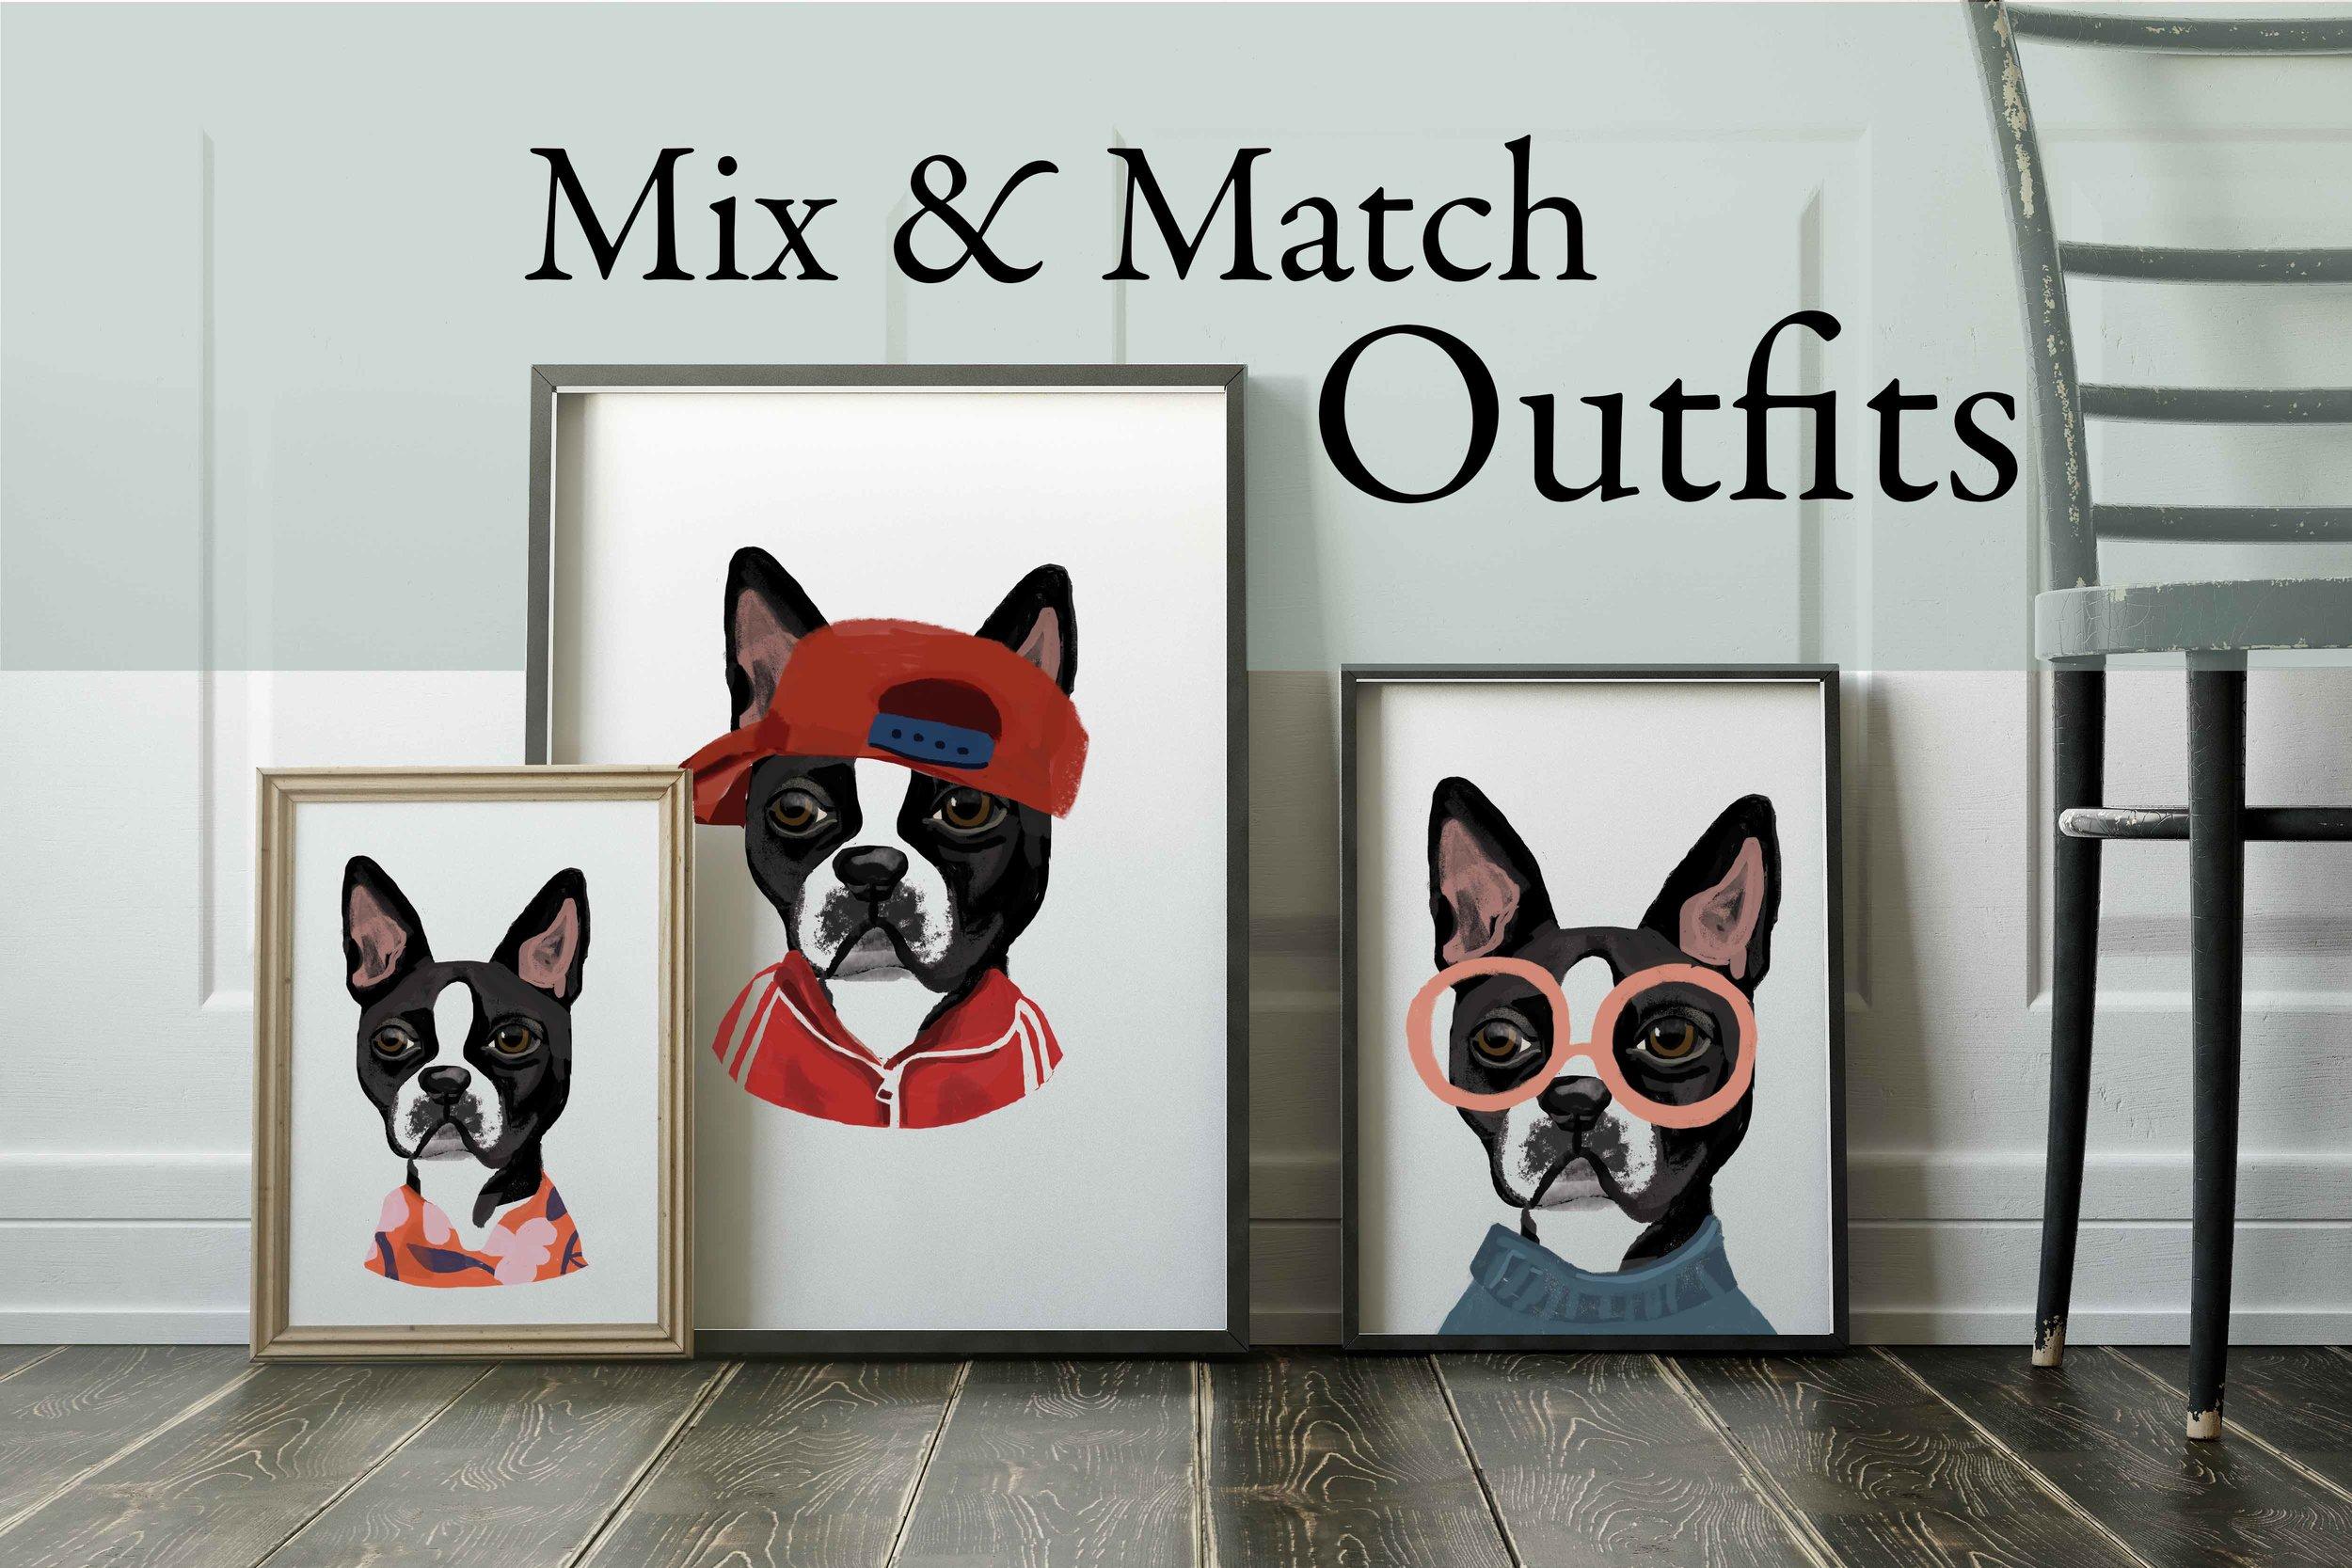 m&m_clothestext.jpg